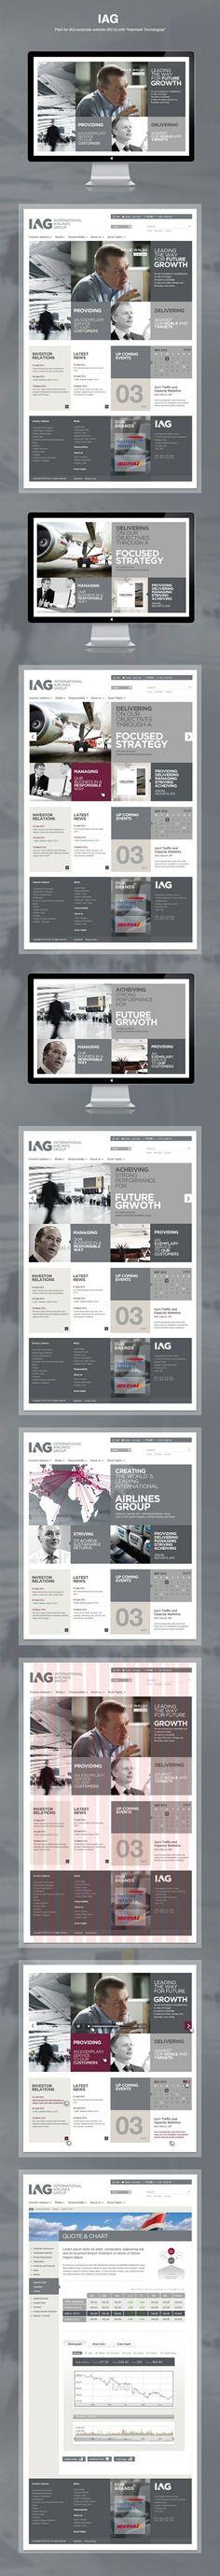 IAG - International Airlines Group   http://www.iairgroup.com   #Webdesign